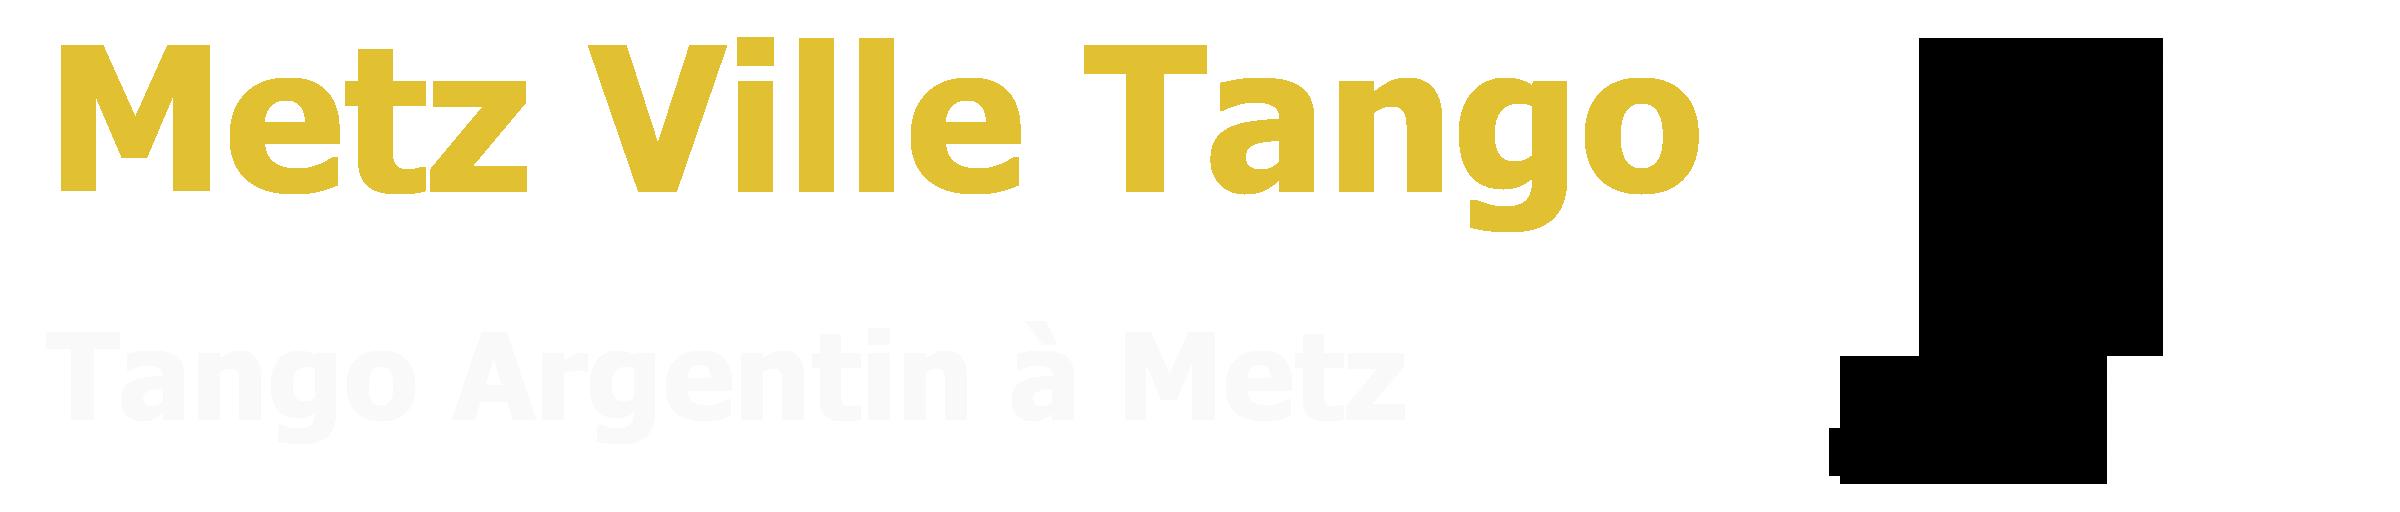 Metz Ville Tango